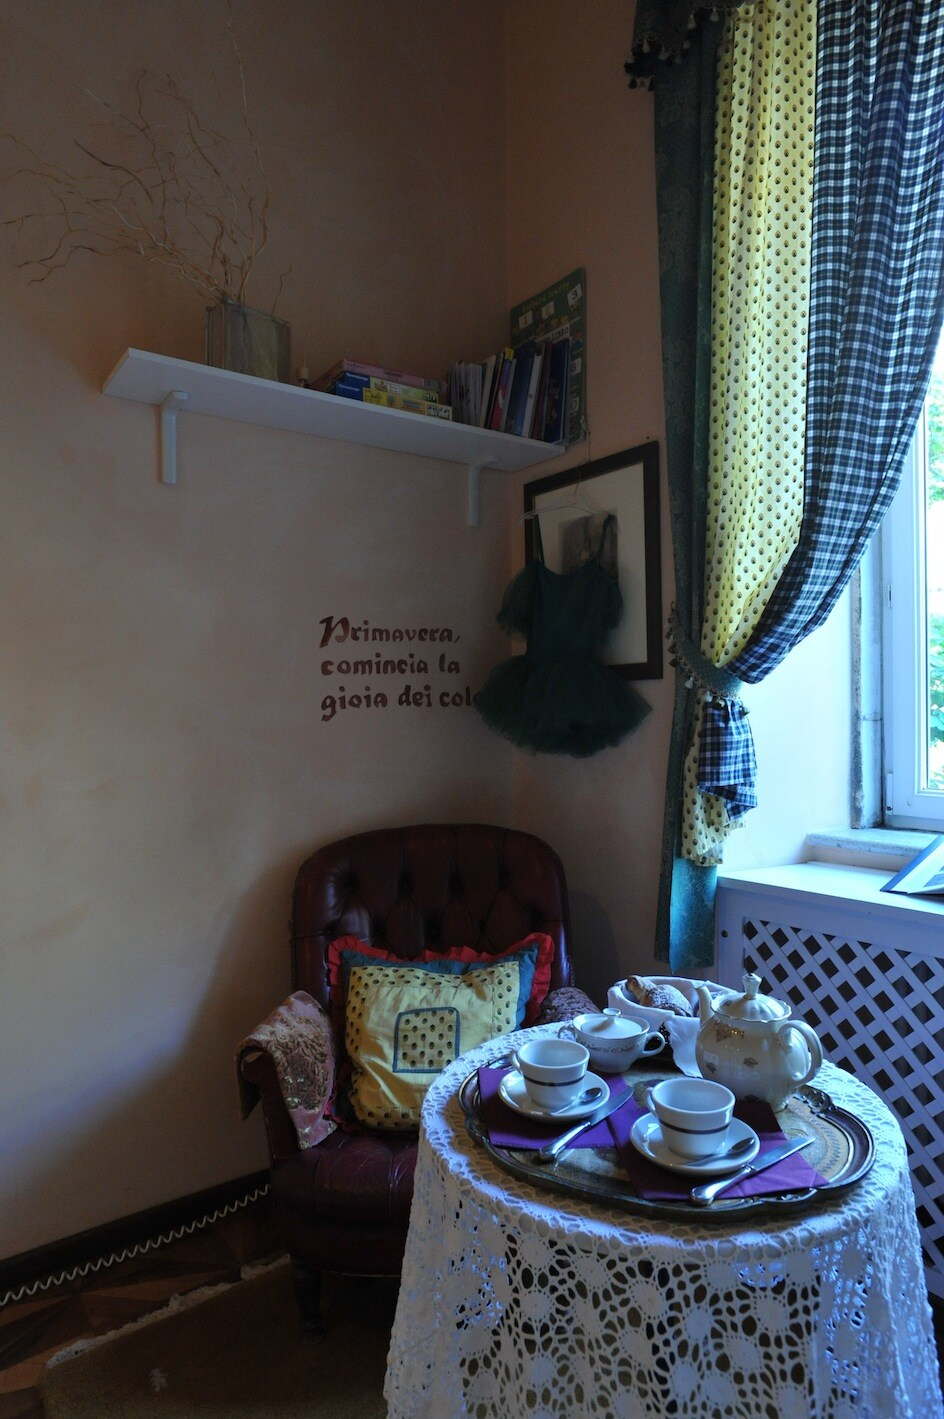 Una pausa tranquilla per il tè